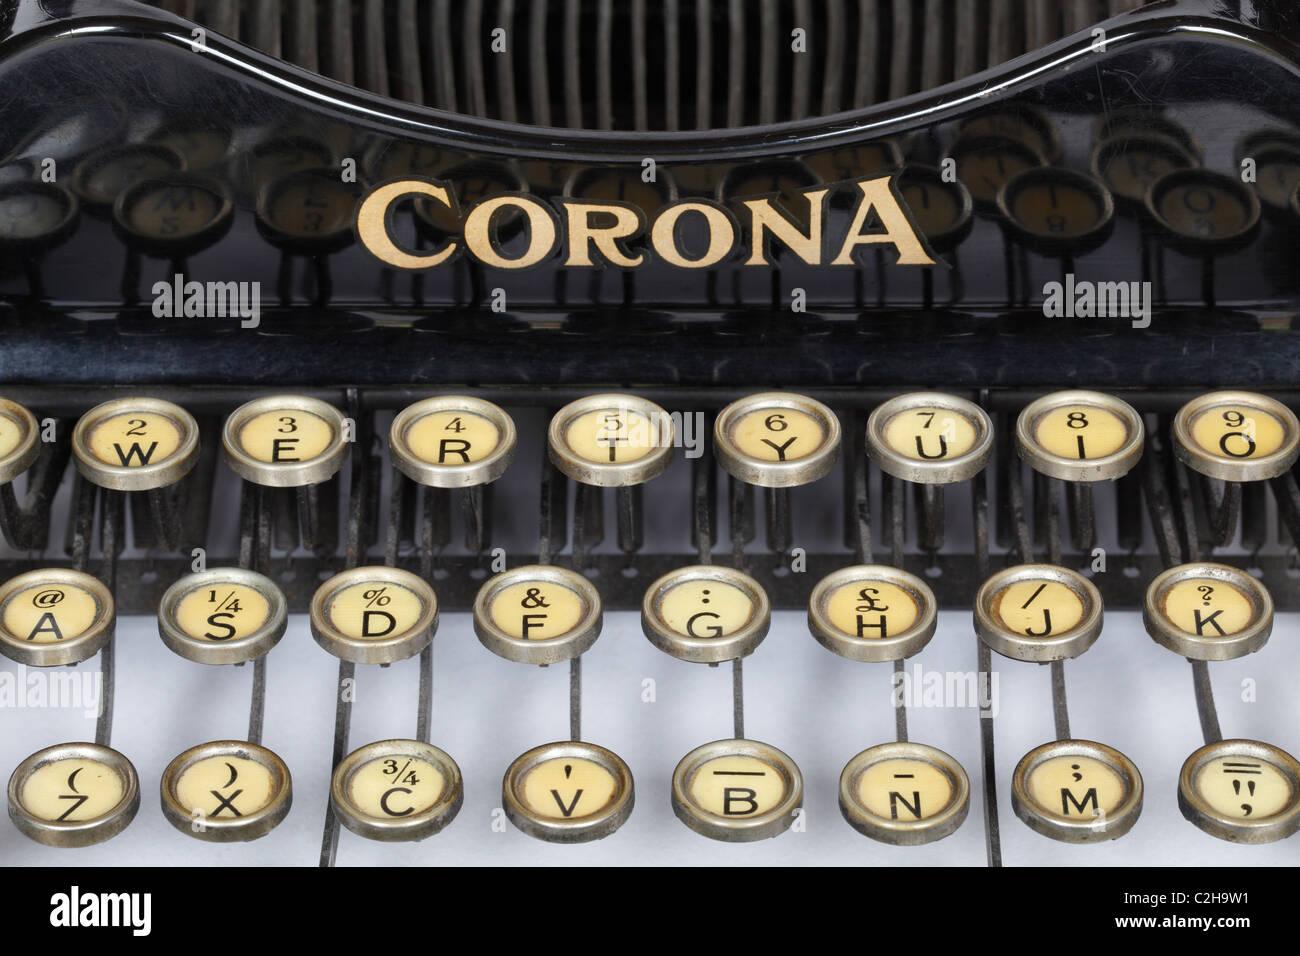 Keys on a vintage Corona 3 folding portable typewriter - Stock Image